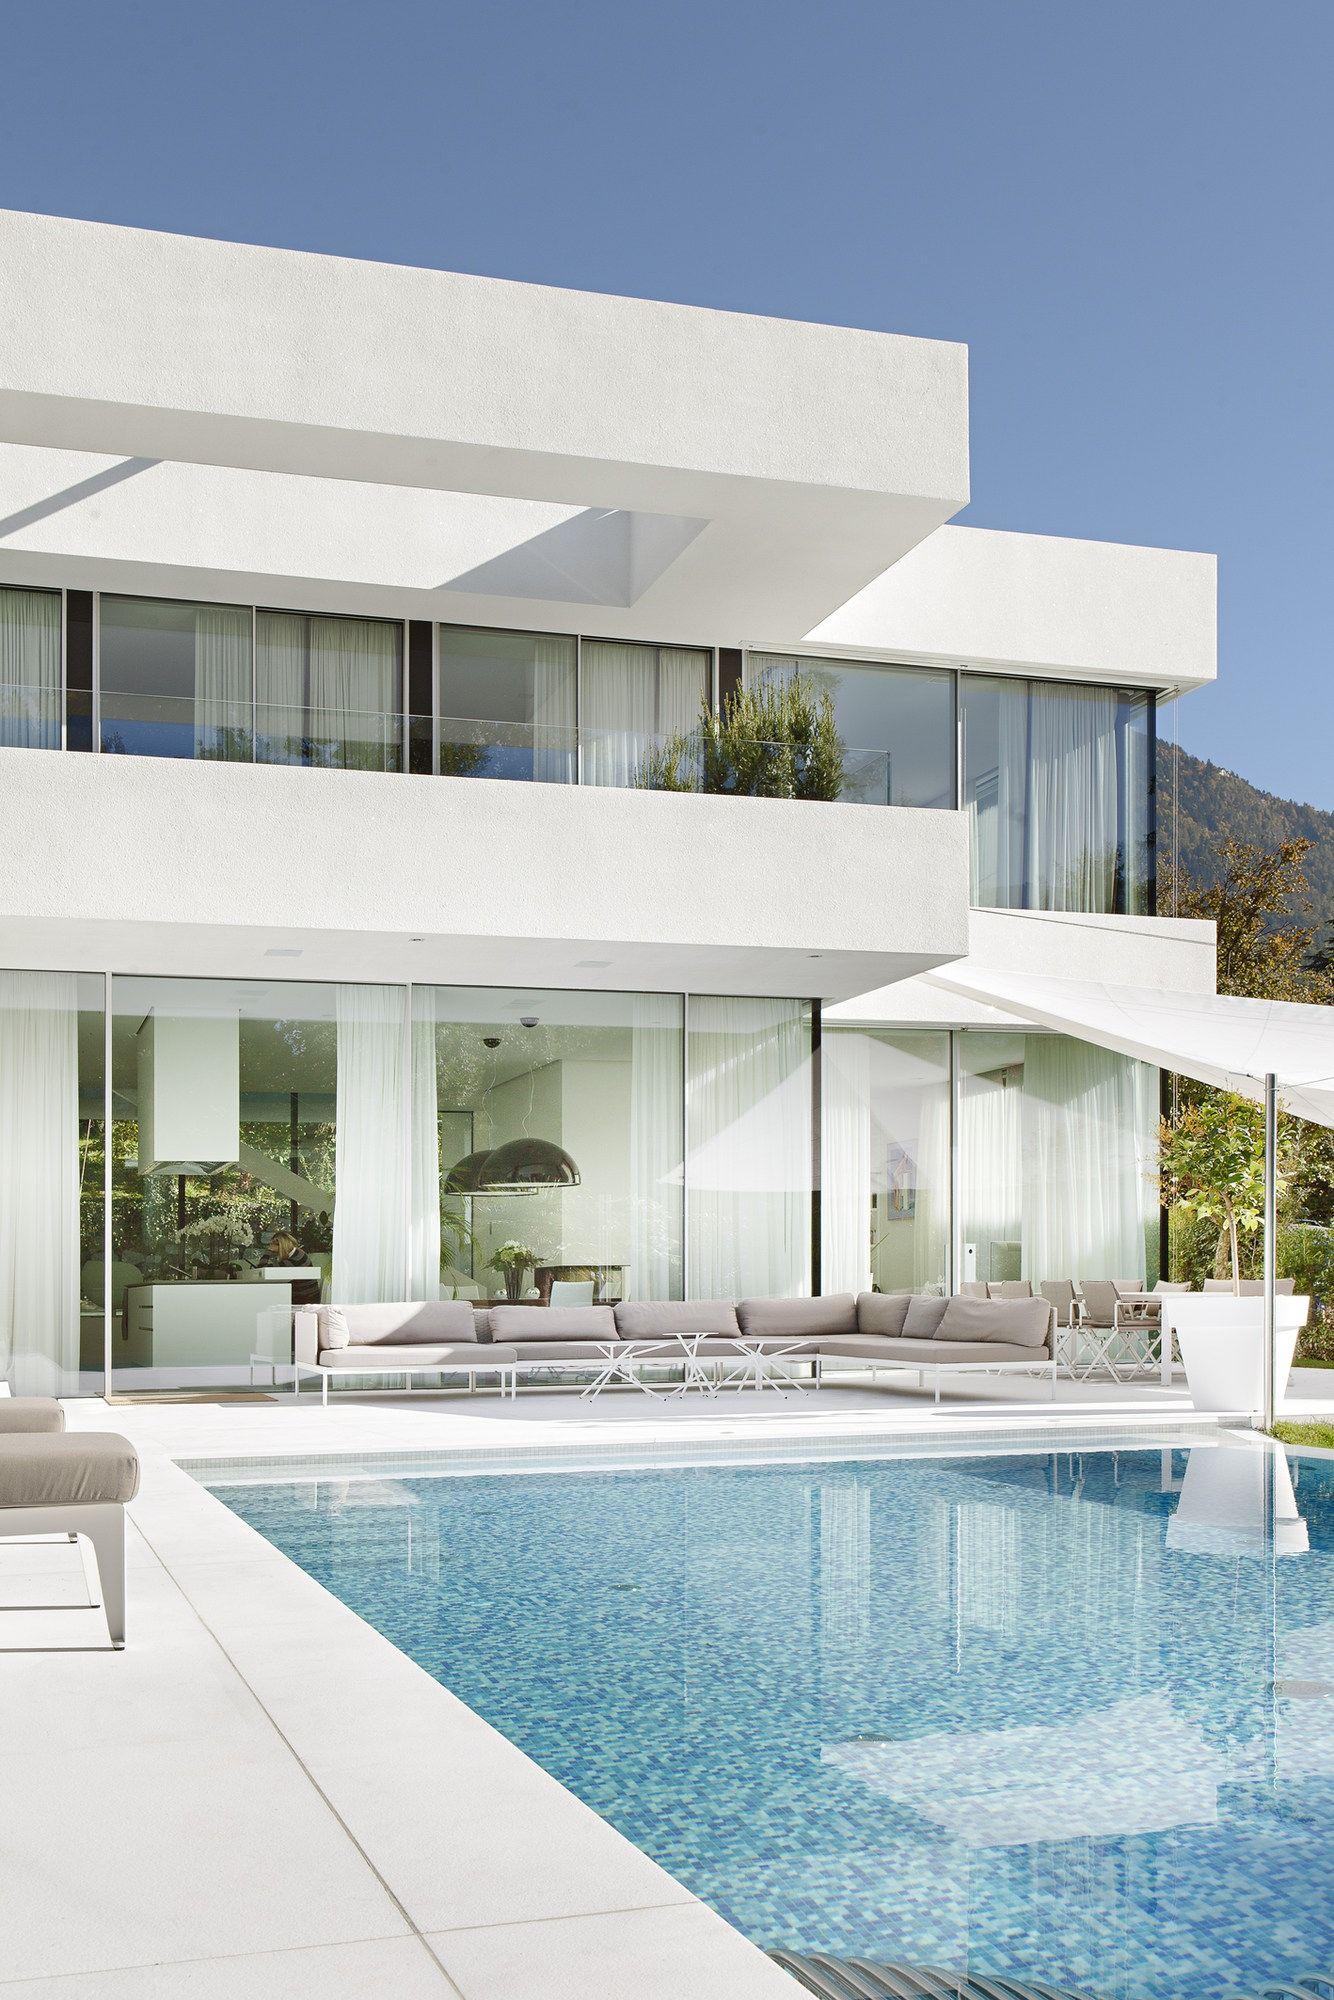 Galer a de casa m monovolume architecture design 12 for Case contemporanee